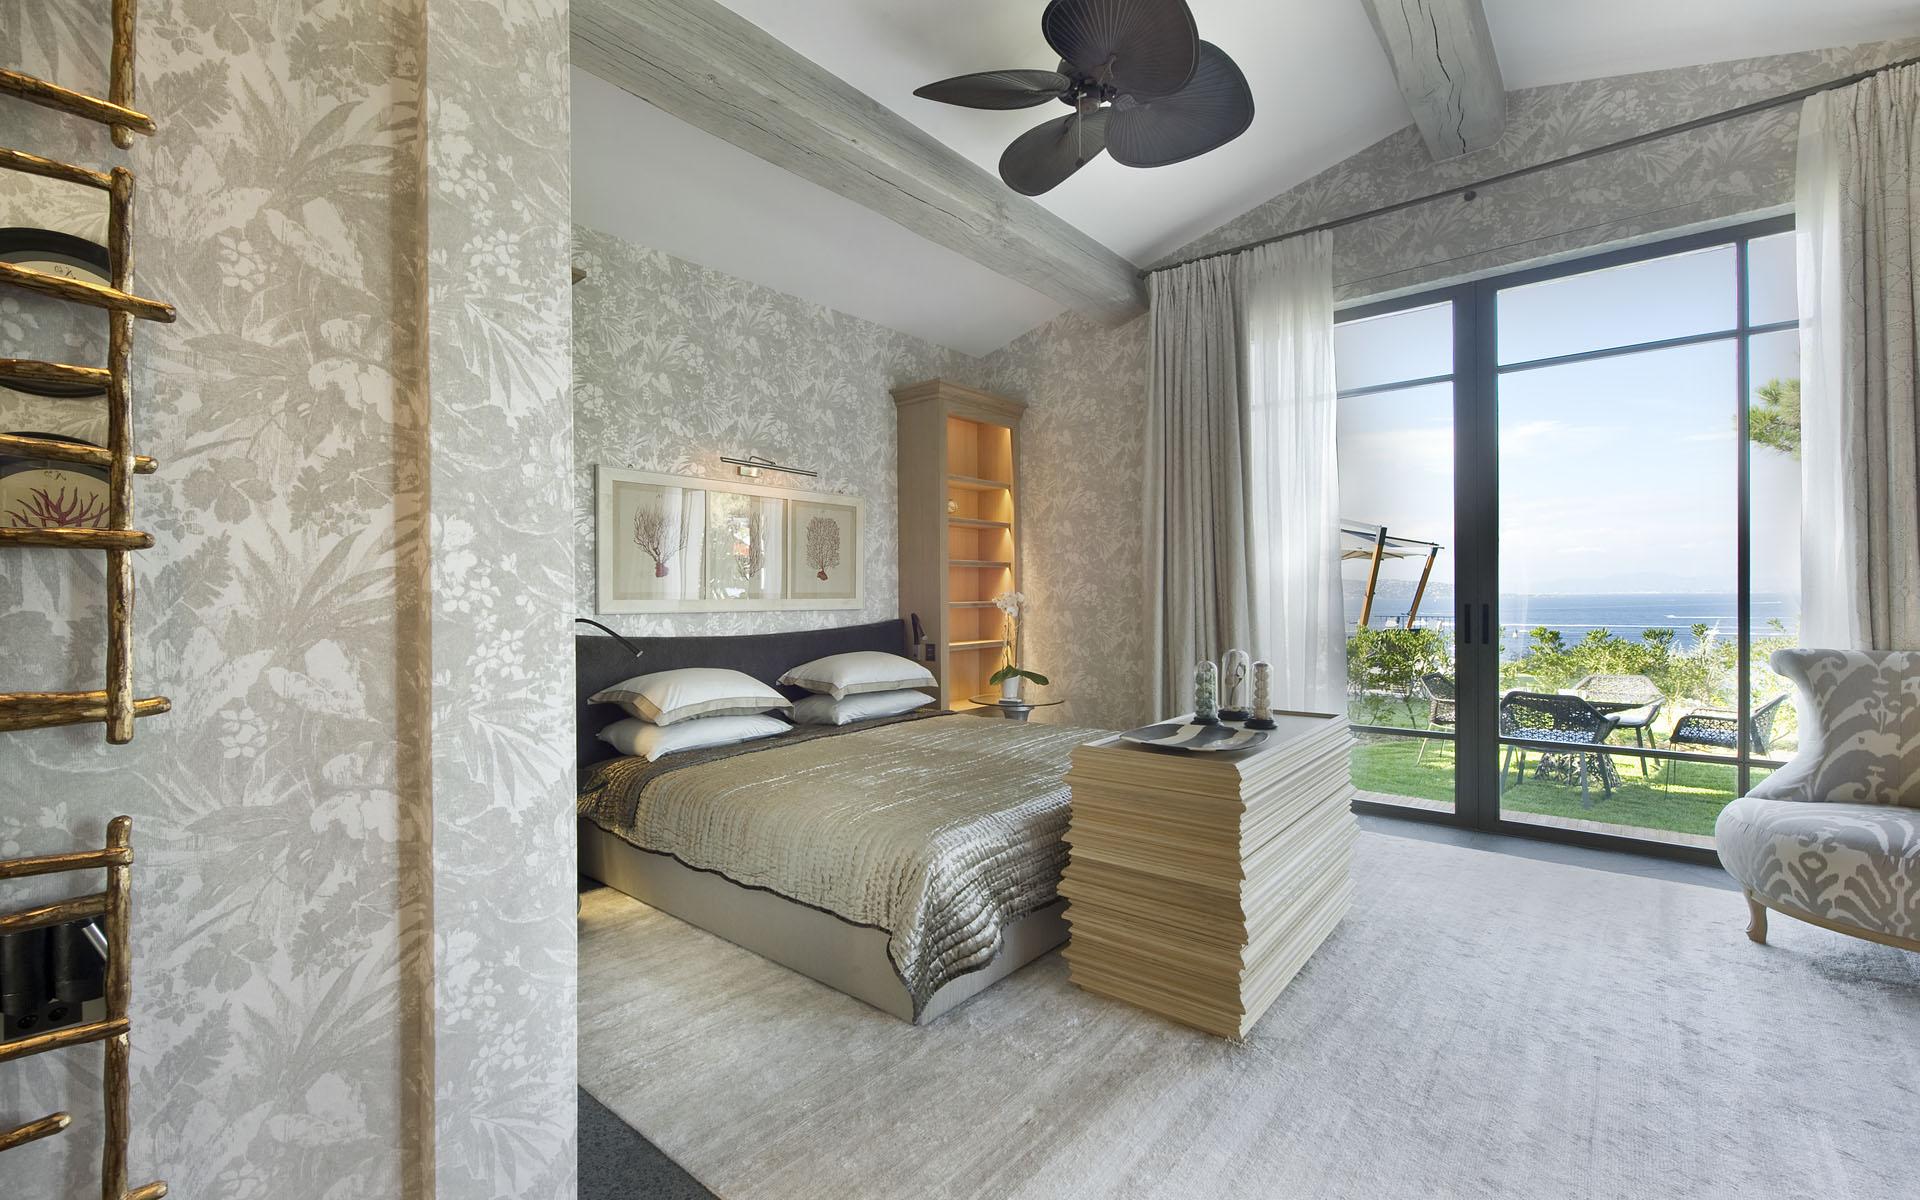 Sttropez's Luxury Villa, Peninsula 1